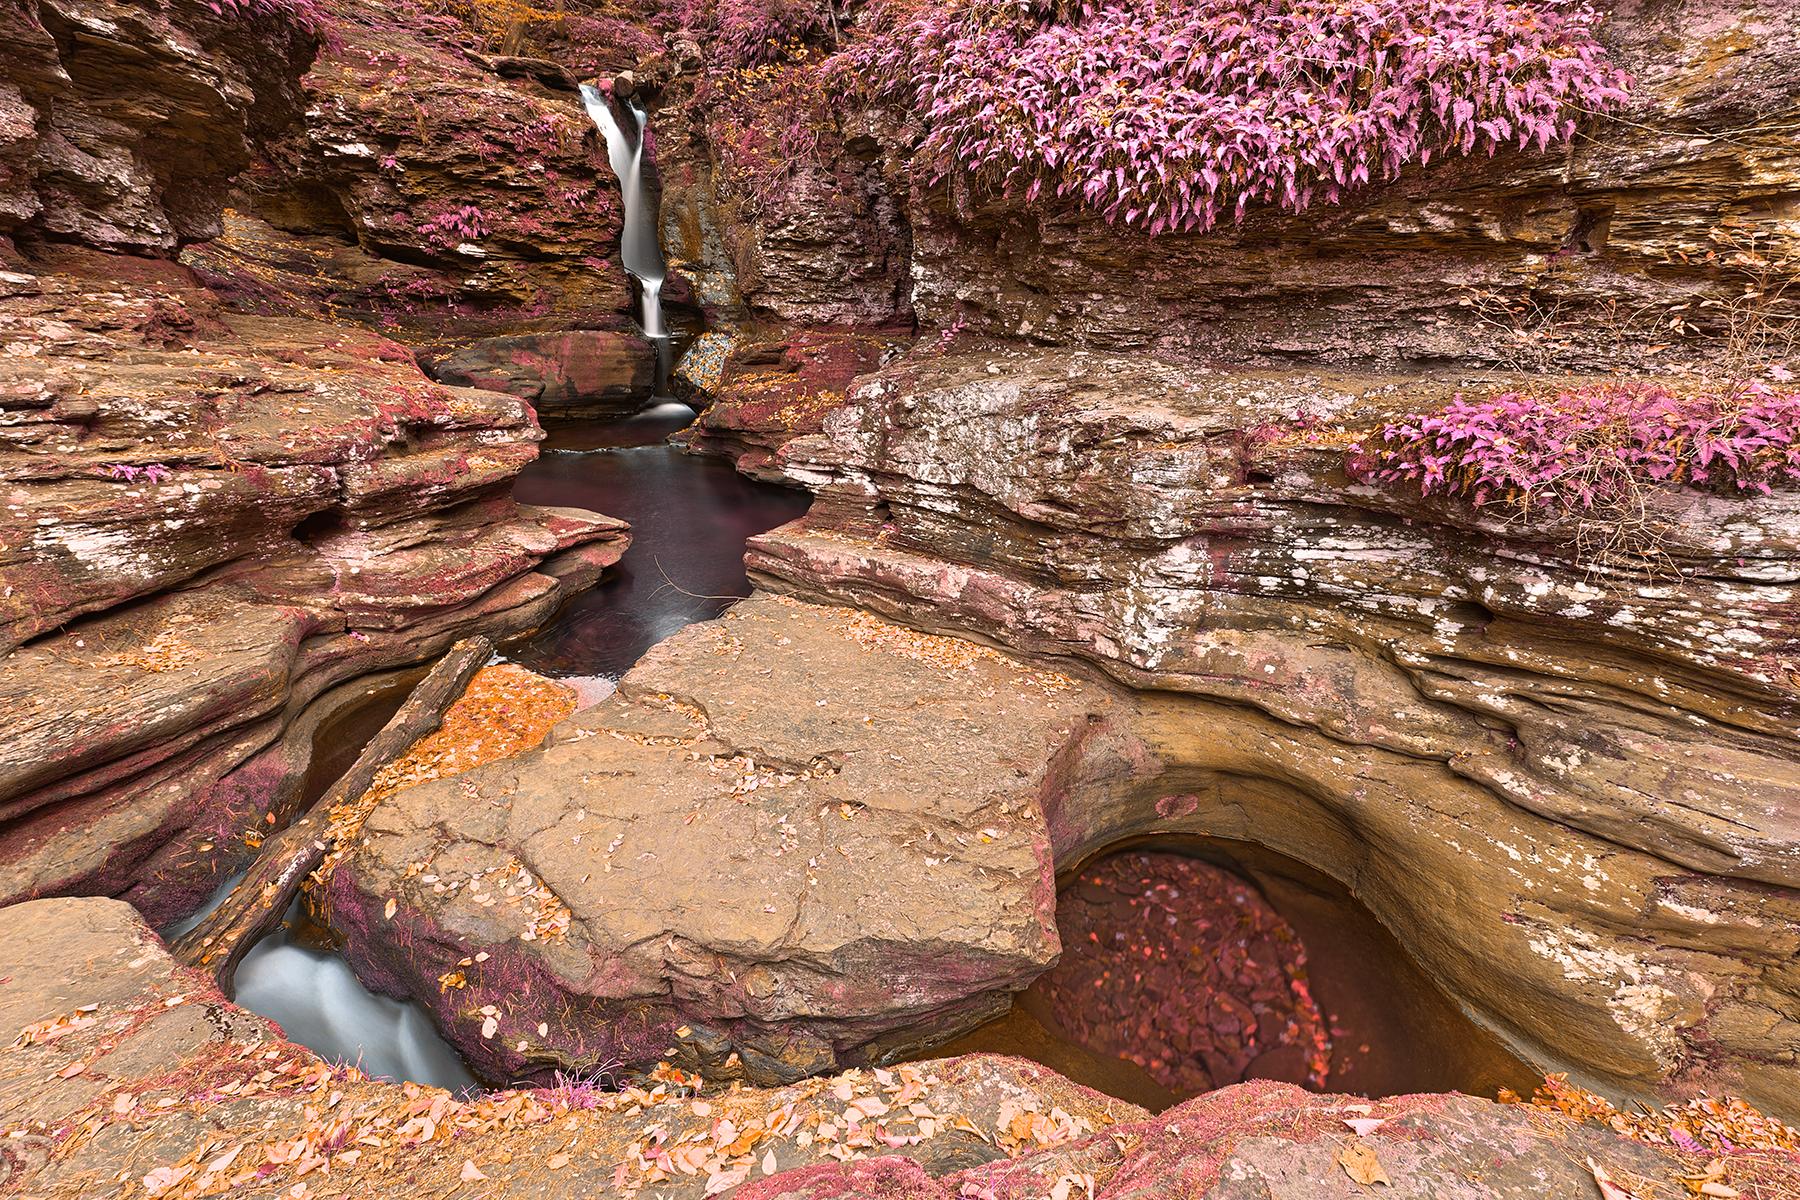 Adams triangle falls - pastel fantasy hdr photo